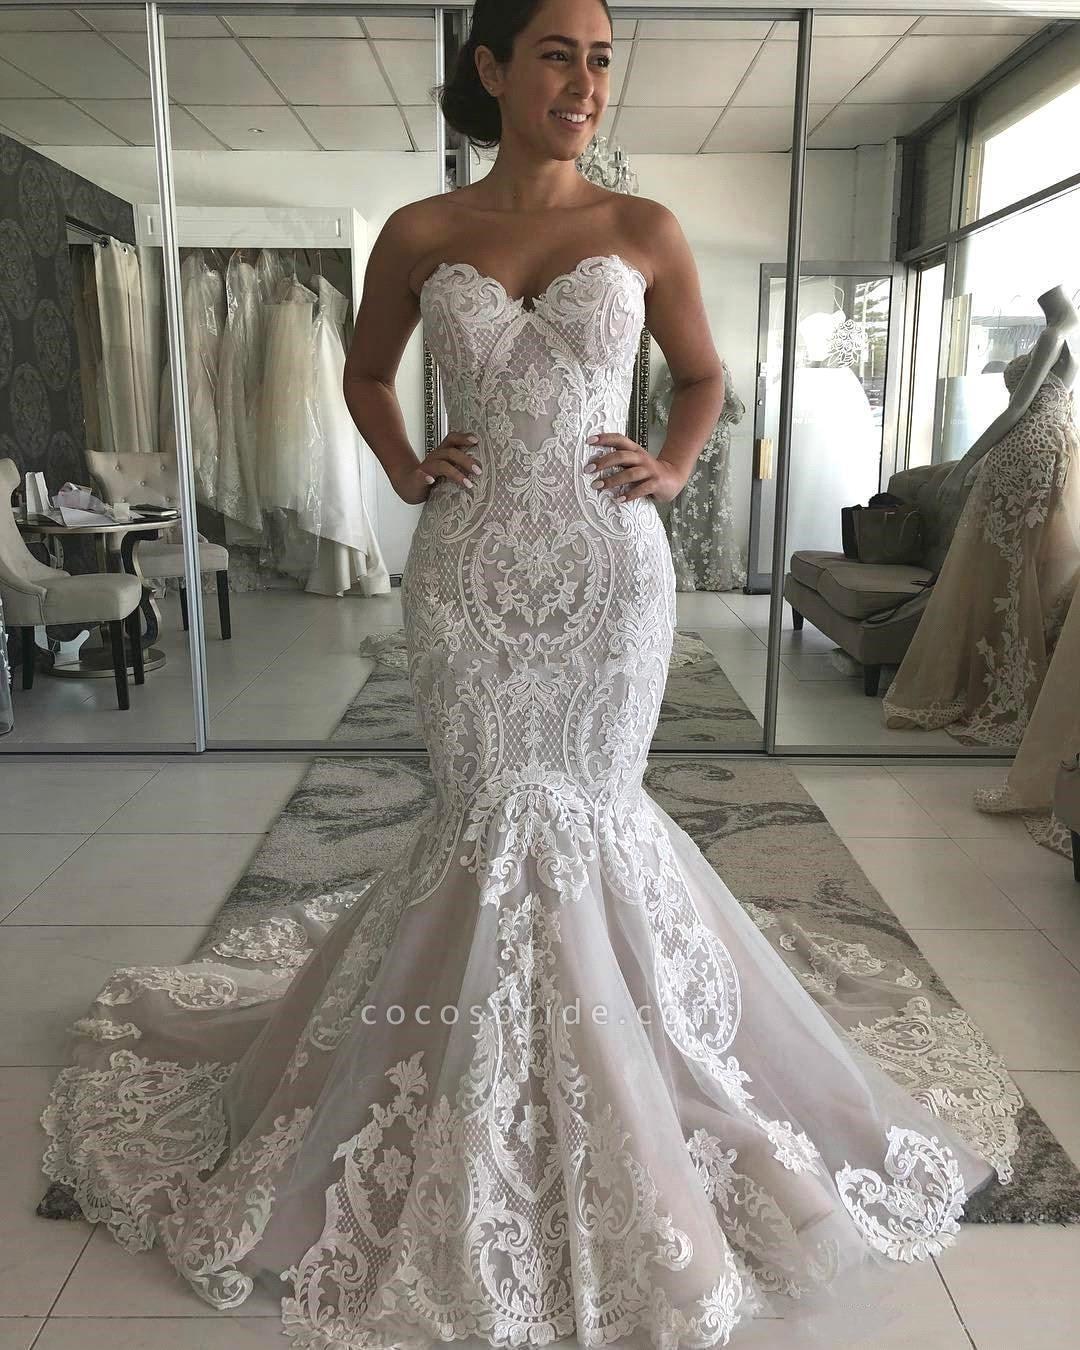 Amazing Strapless Appliques Mermaid Wedding Dress